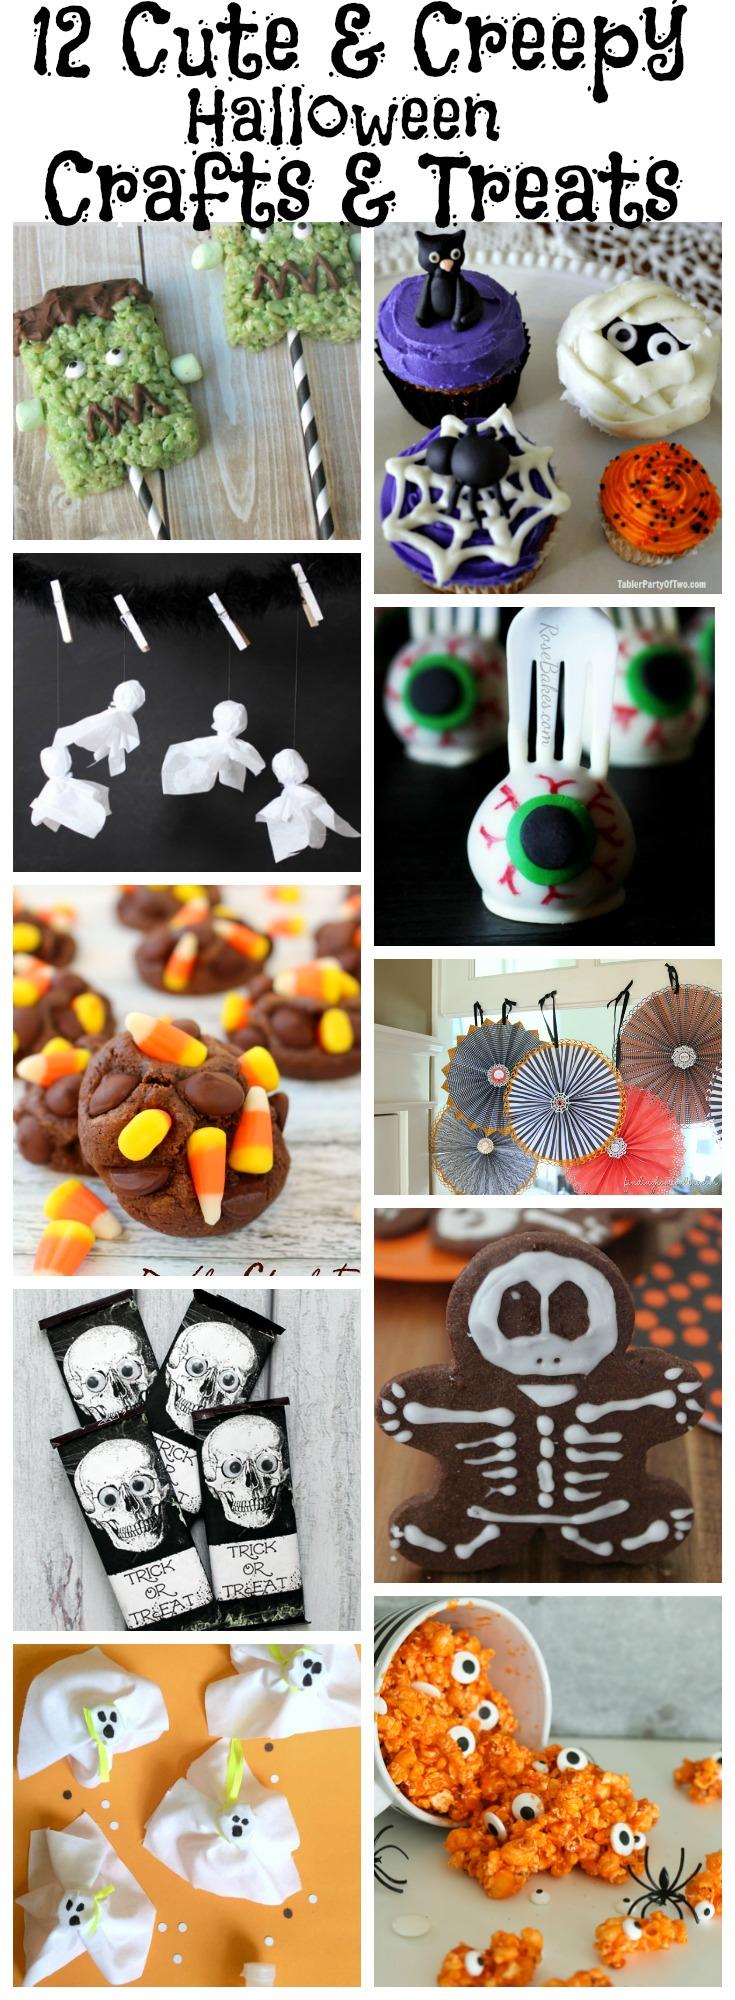 12 Cute & Creepy Halloween Crafts & Treats {Work it Wednesday} | The ...